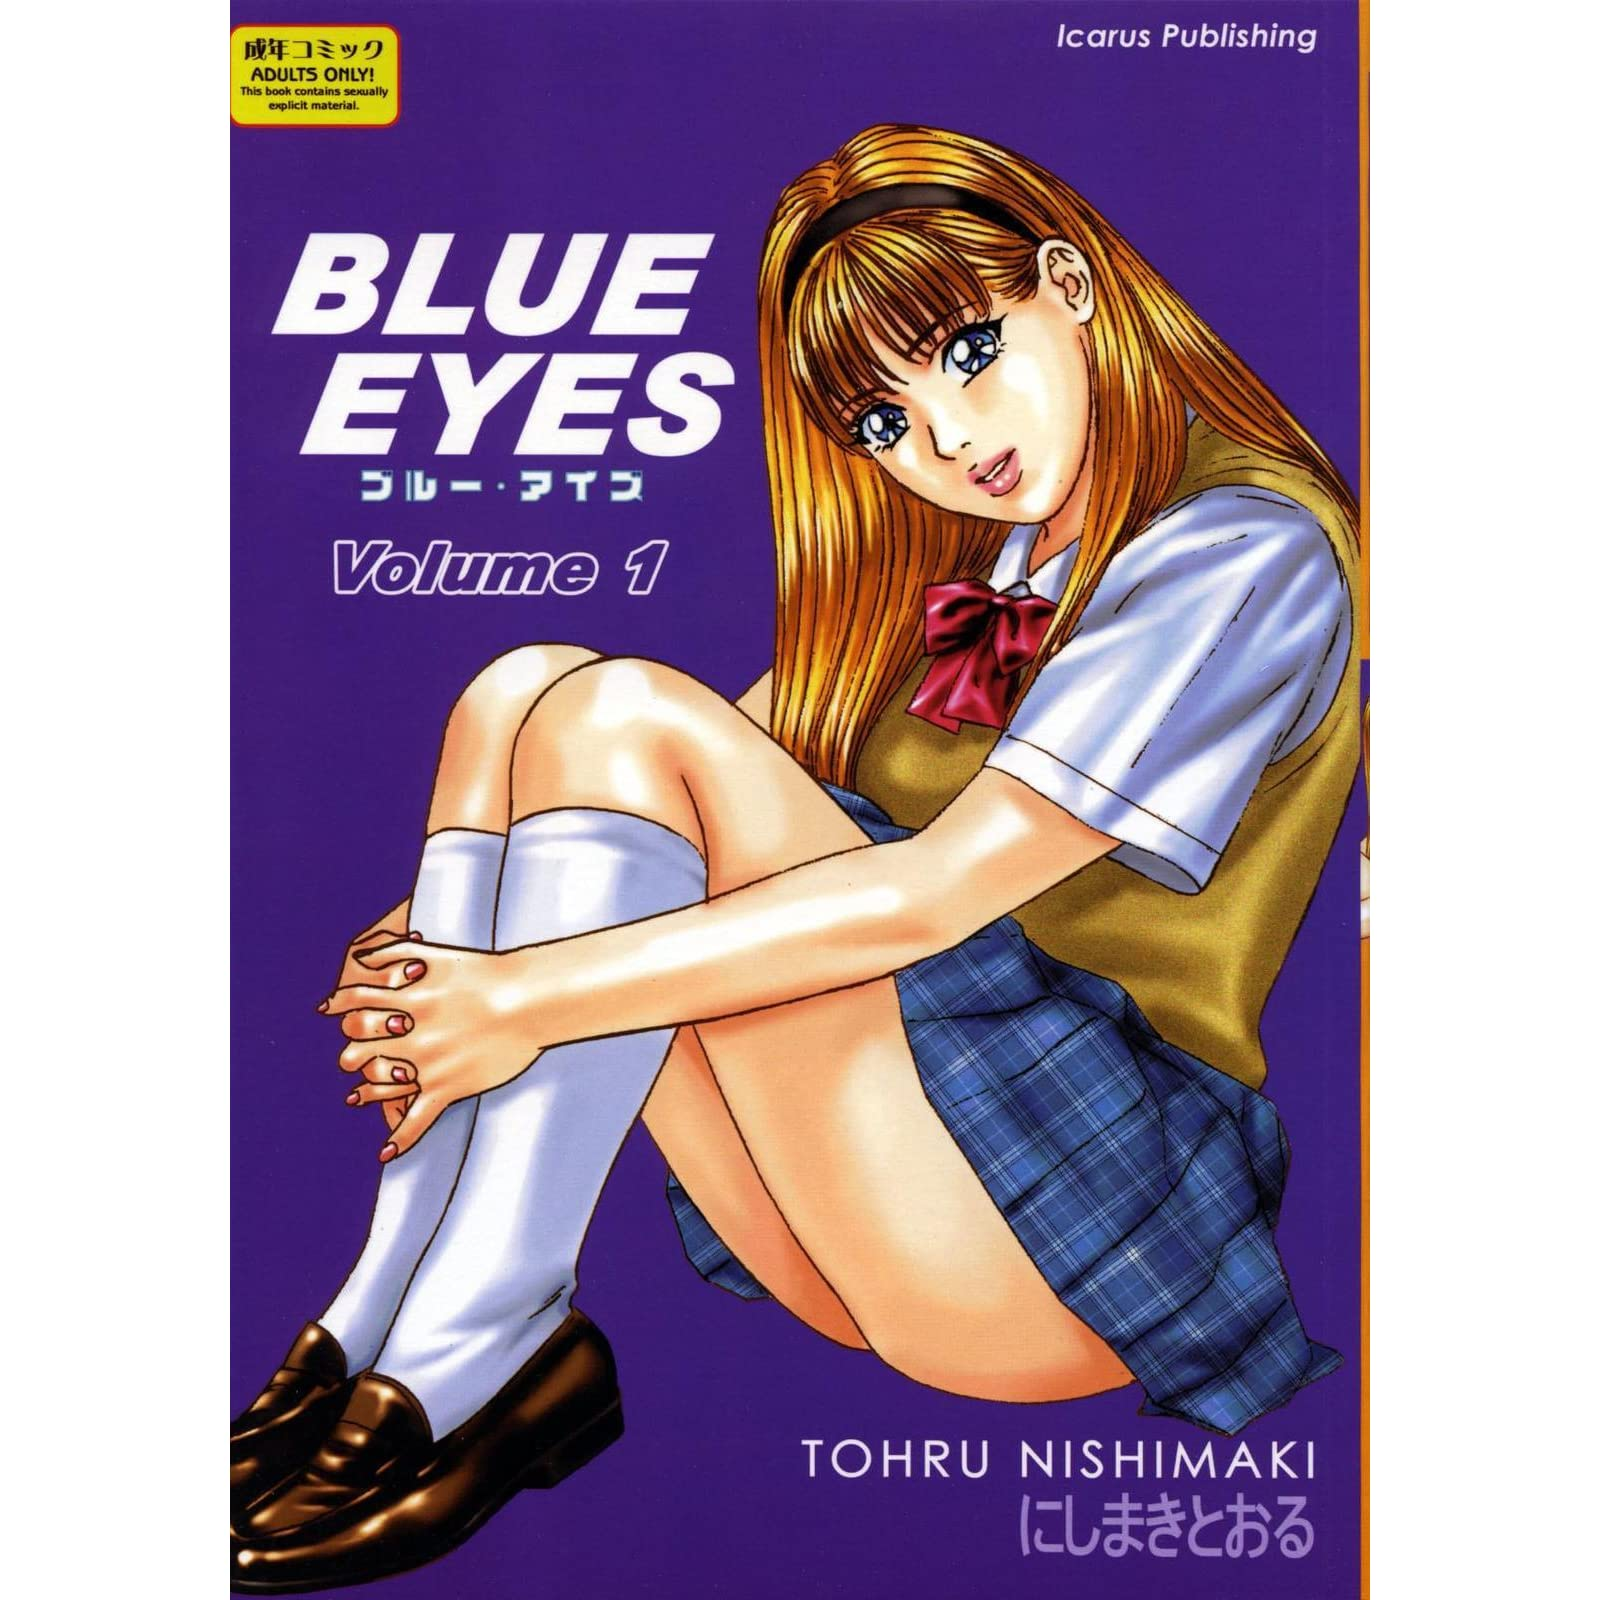 Blue eyes vol 5 hentai